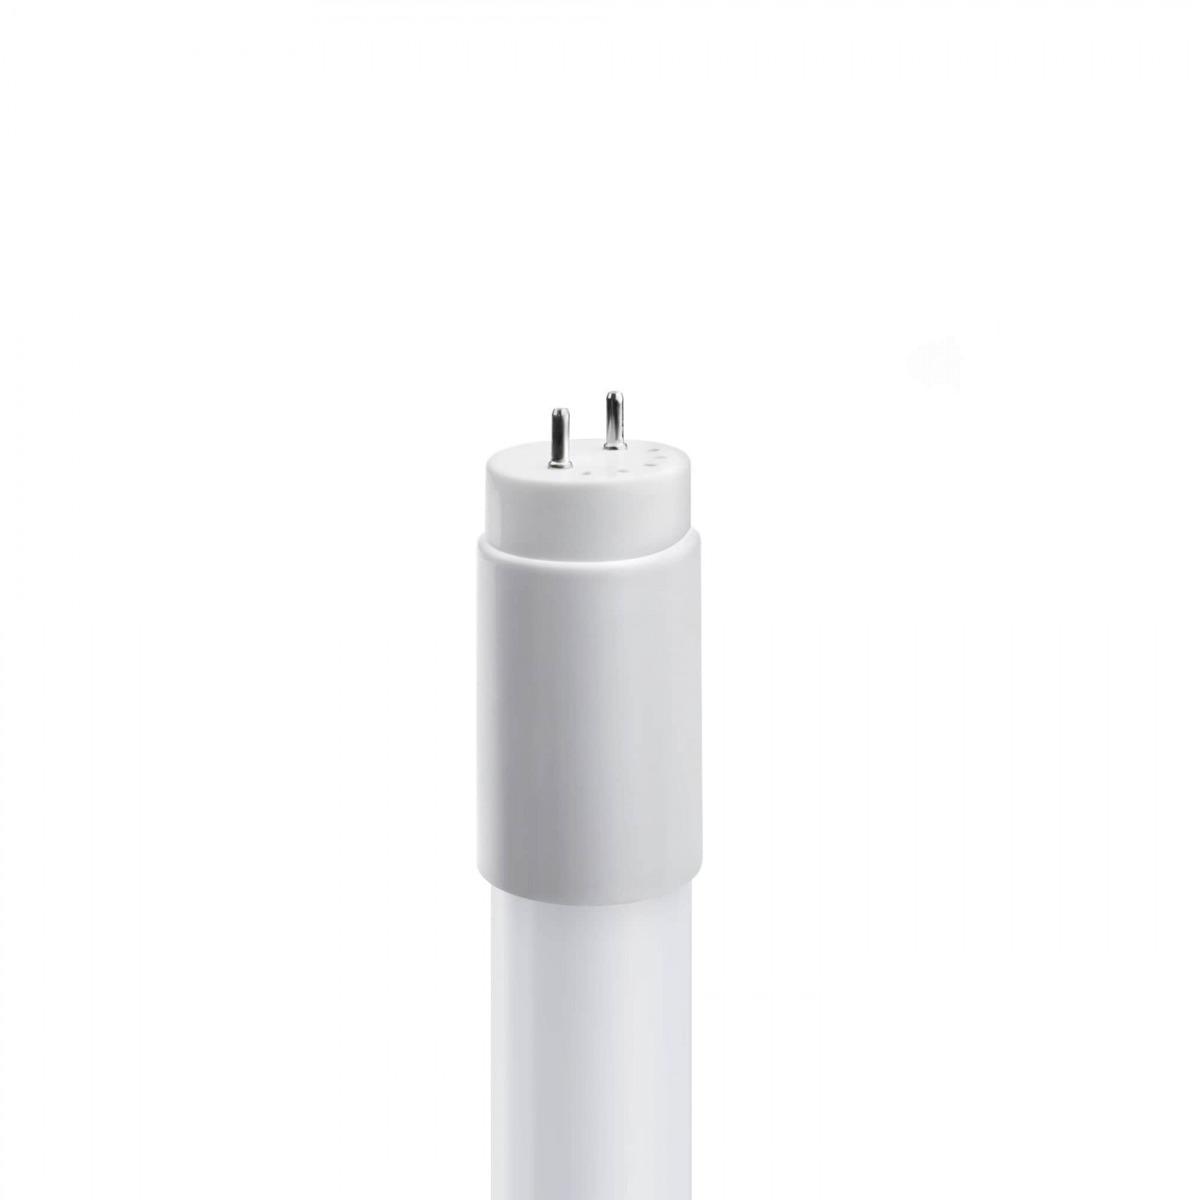 Mirrorstone 600MM, 2FT T8 LED TUBE LIGHT